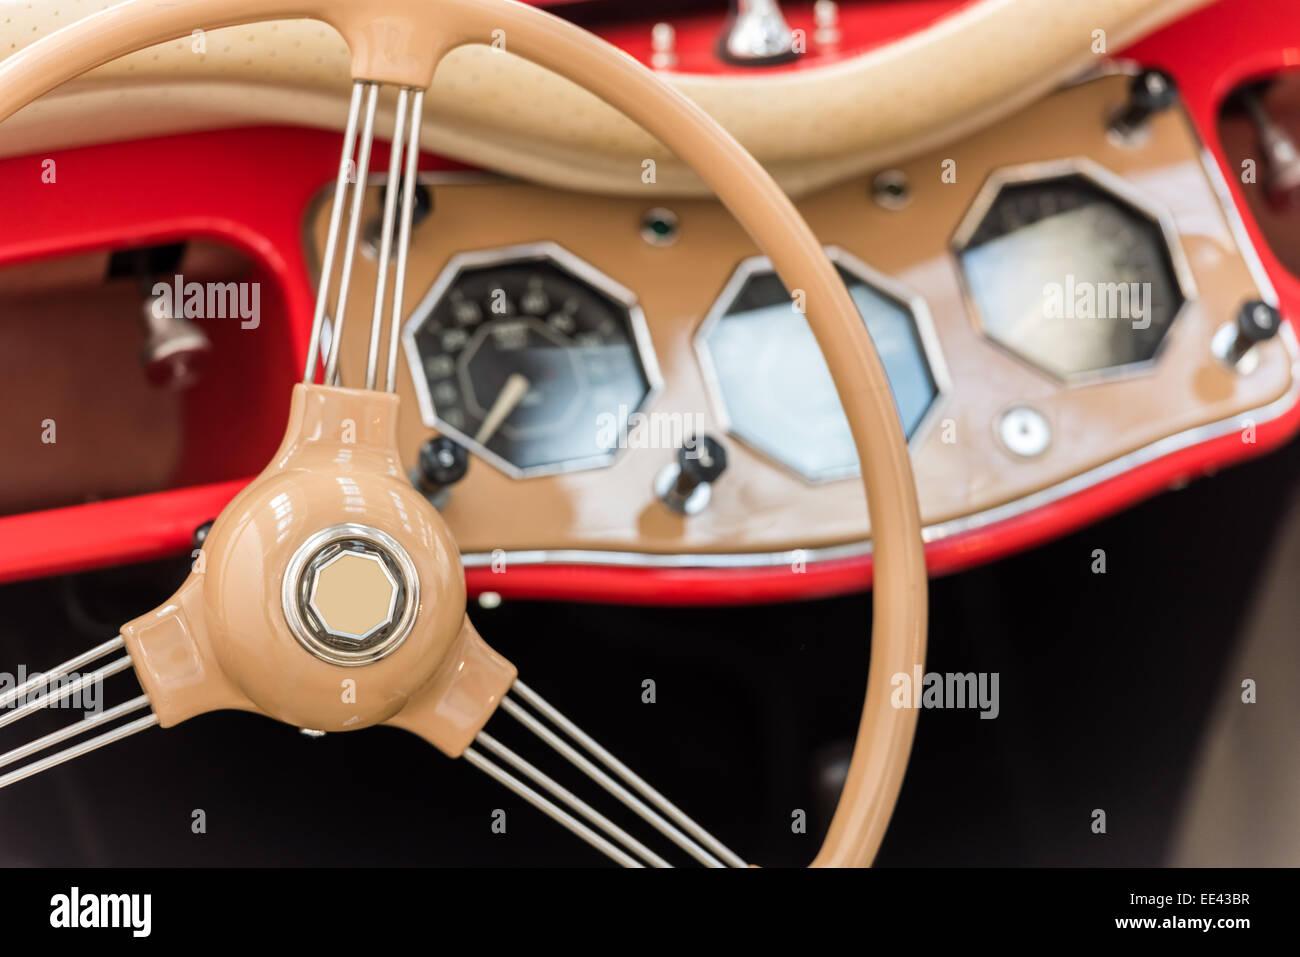 Vintage Car Interior With Retro Dashboard Stock Photo 77537147 Alamy